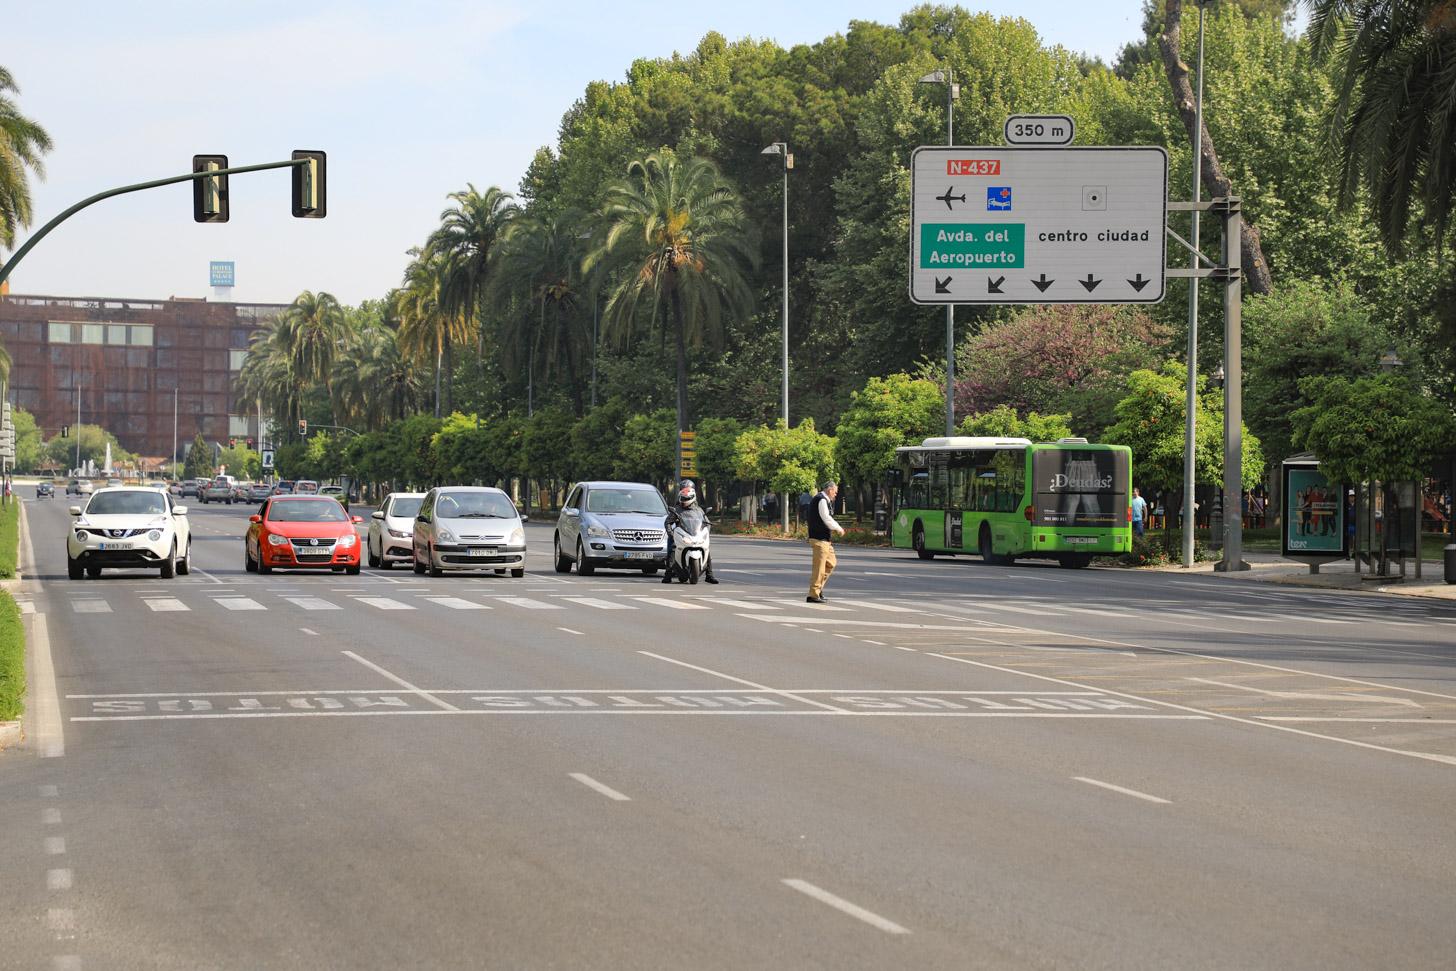 Autorijden in Córdoba